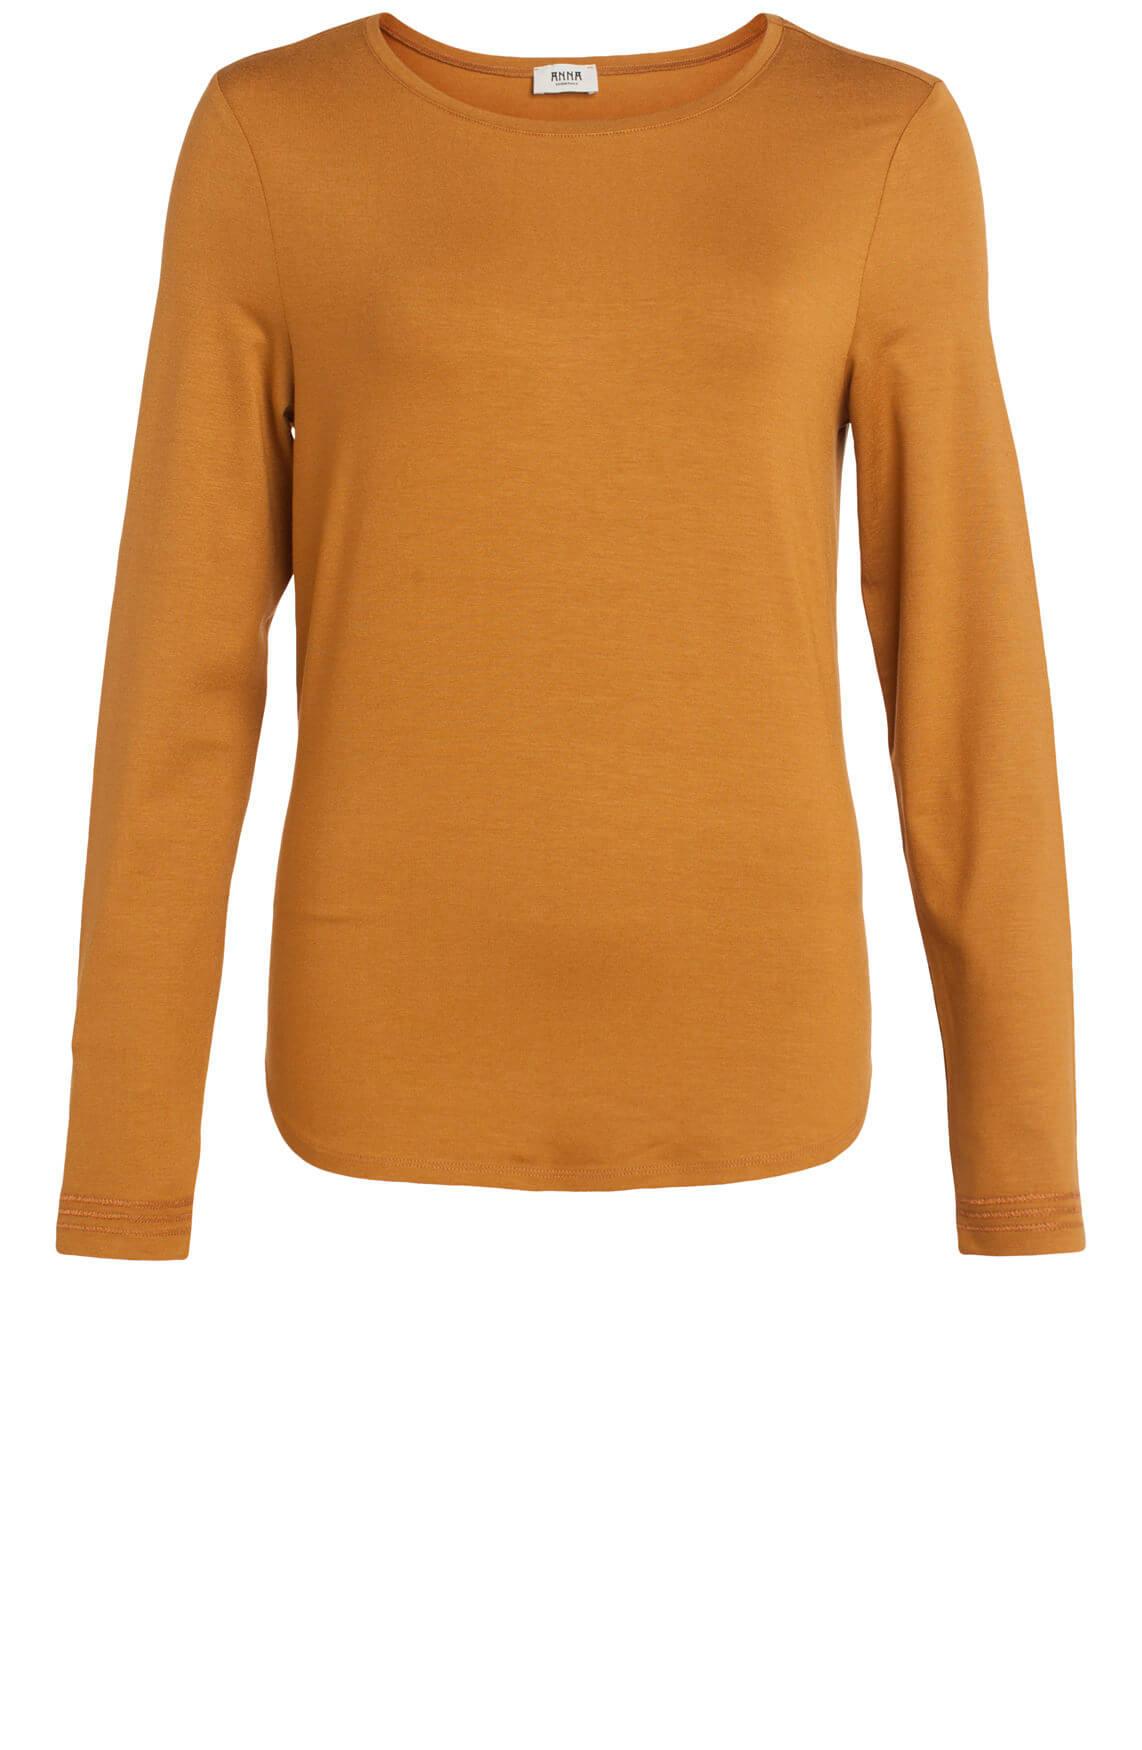 Anna Dames Shirt met stikseldetail Bruin